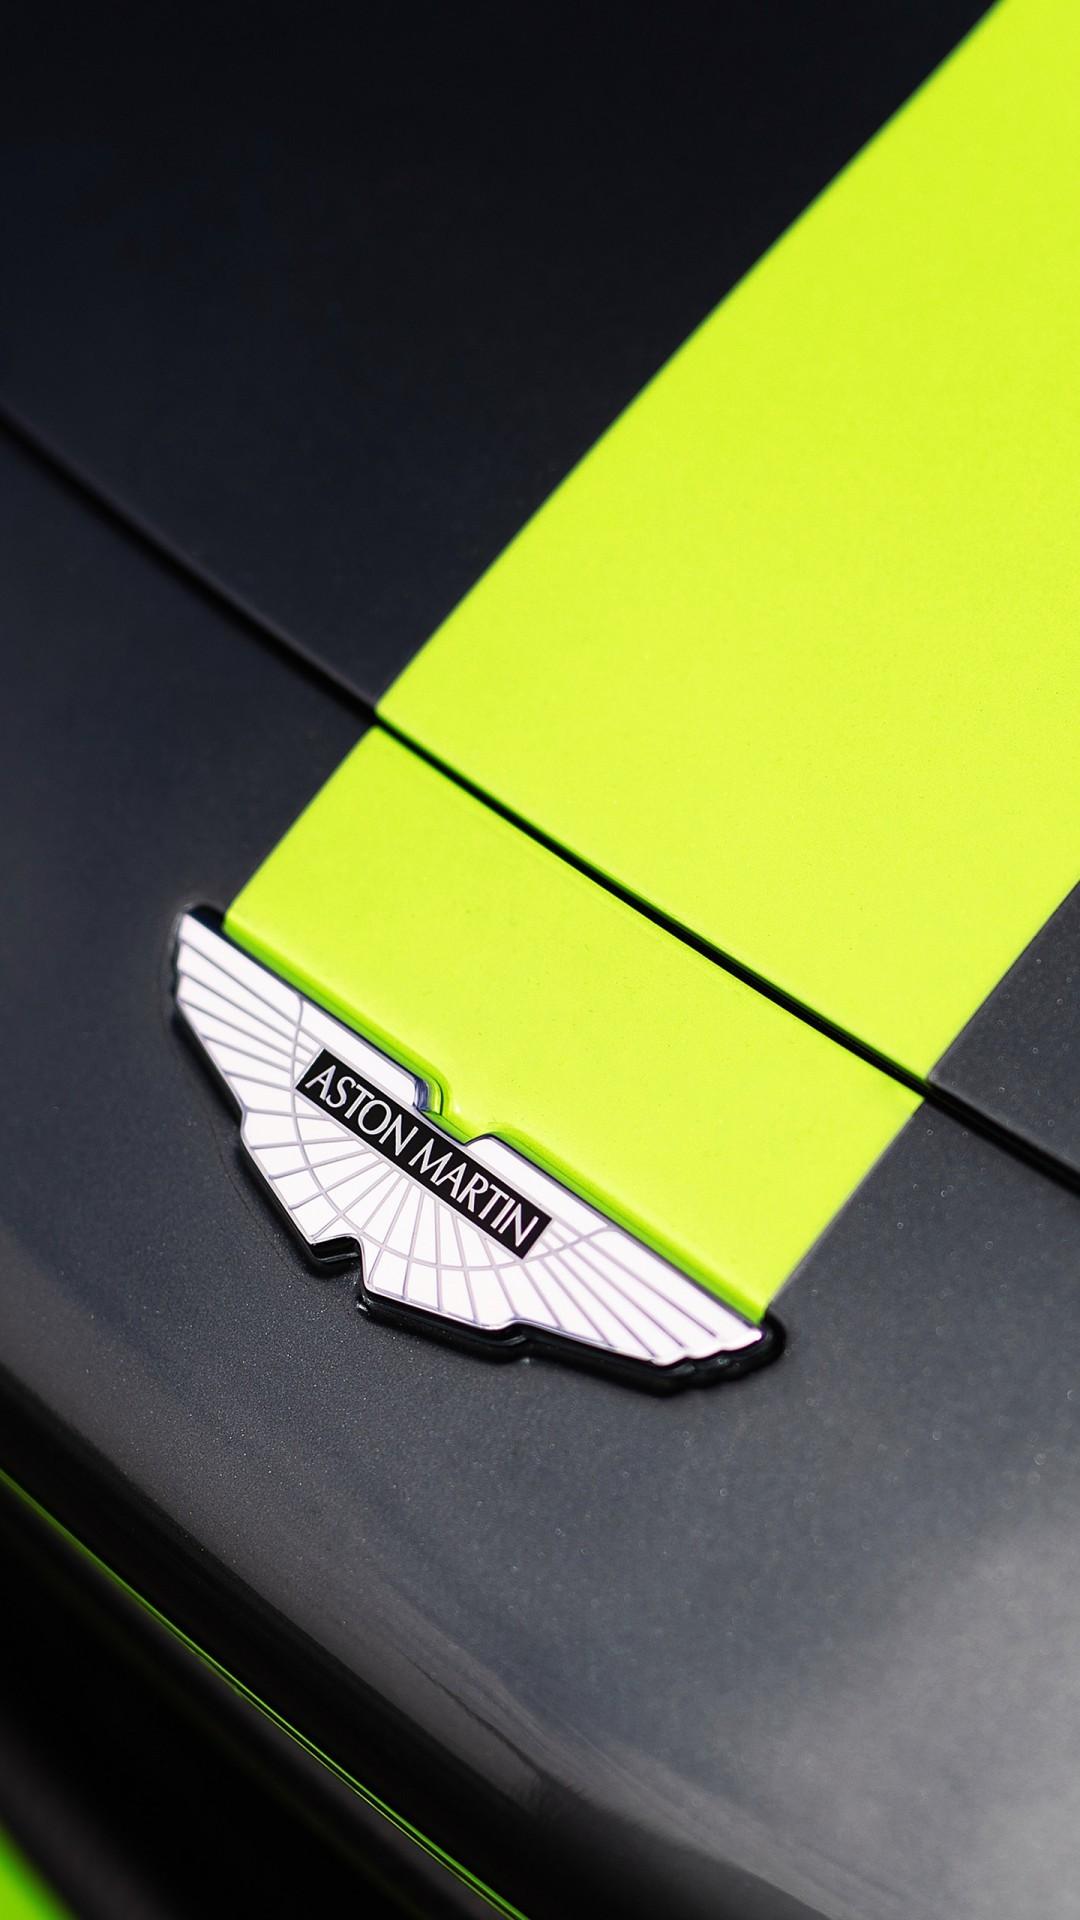 Free Aston Martin Vantage GT3 phone wallpaper by flakitarubia27